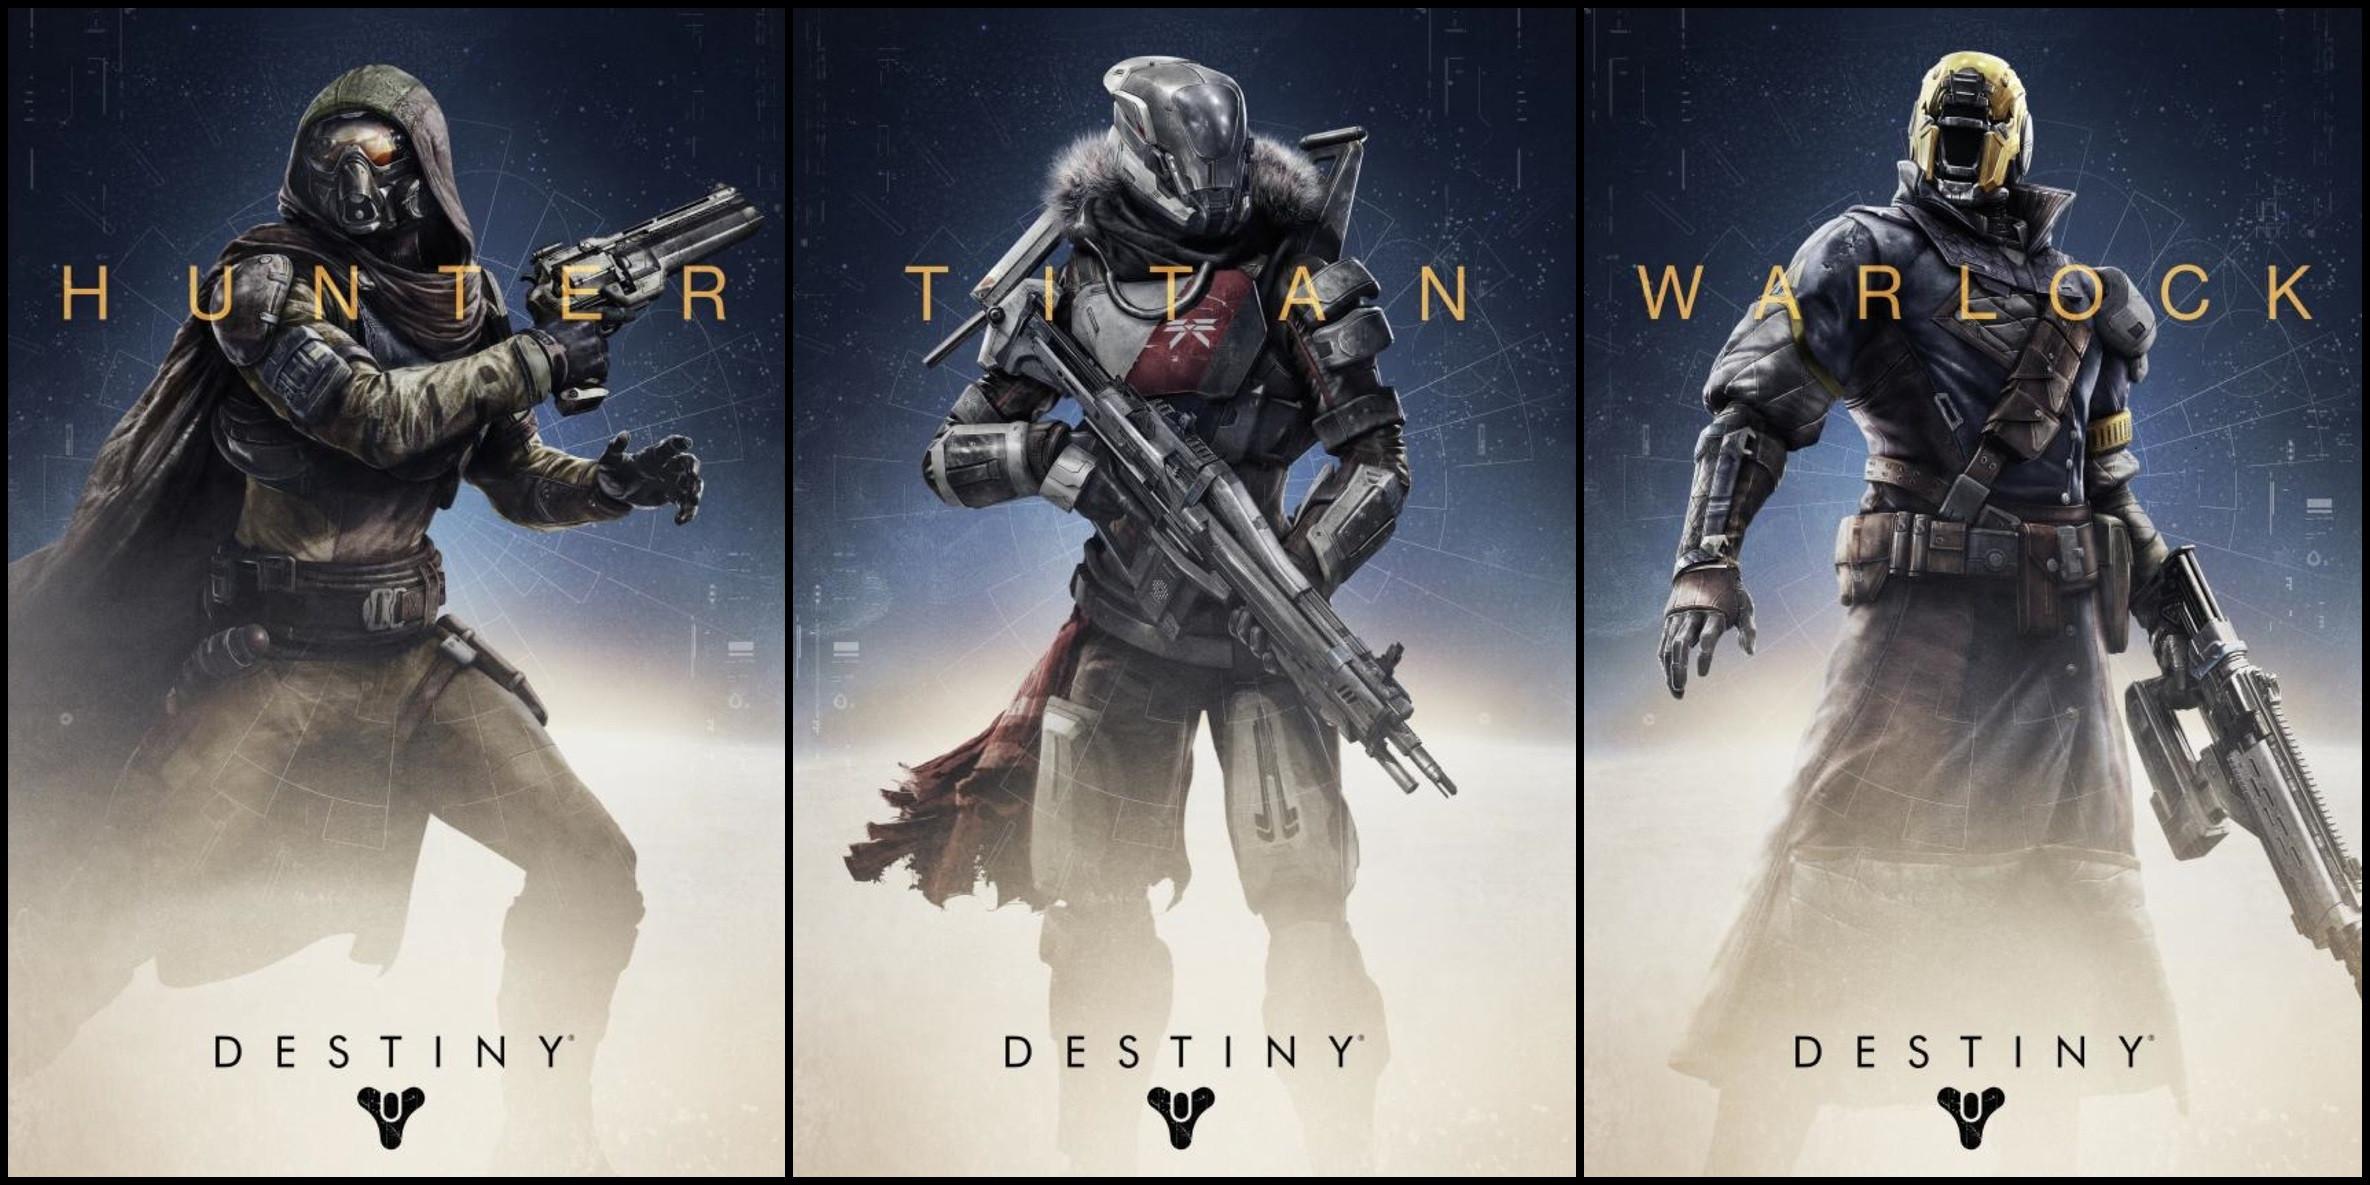 destinyguardians.jpg